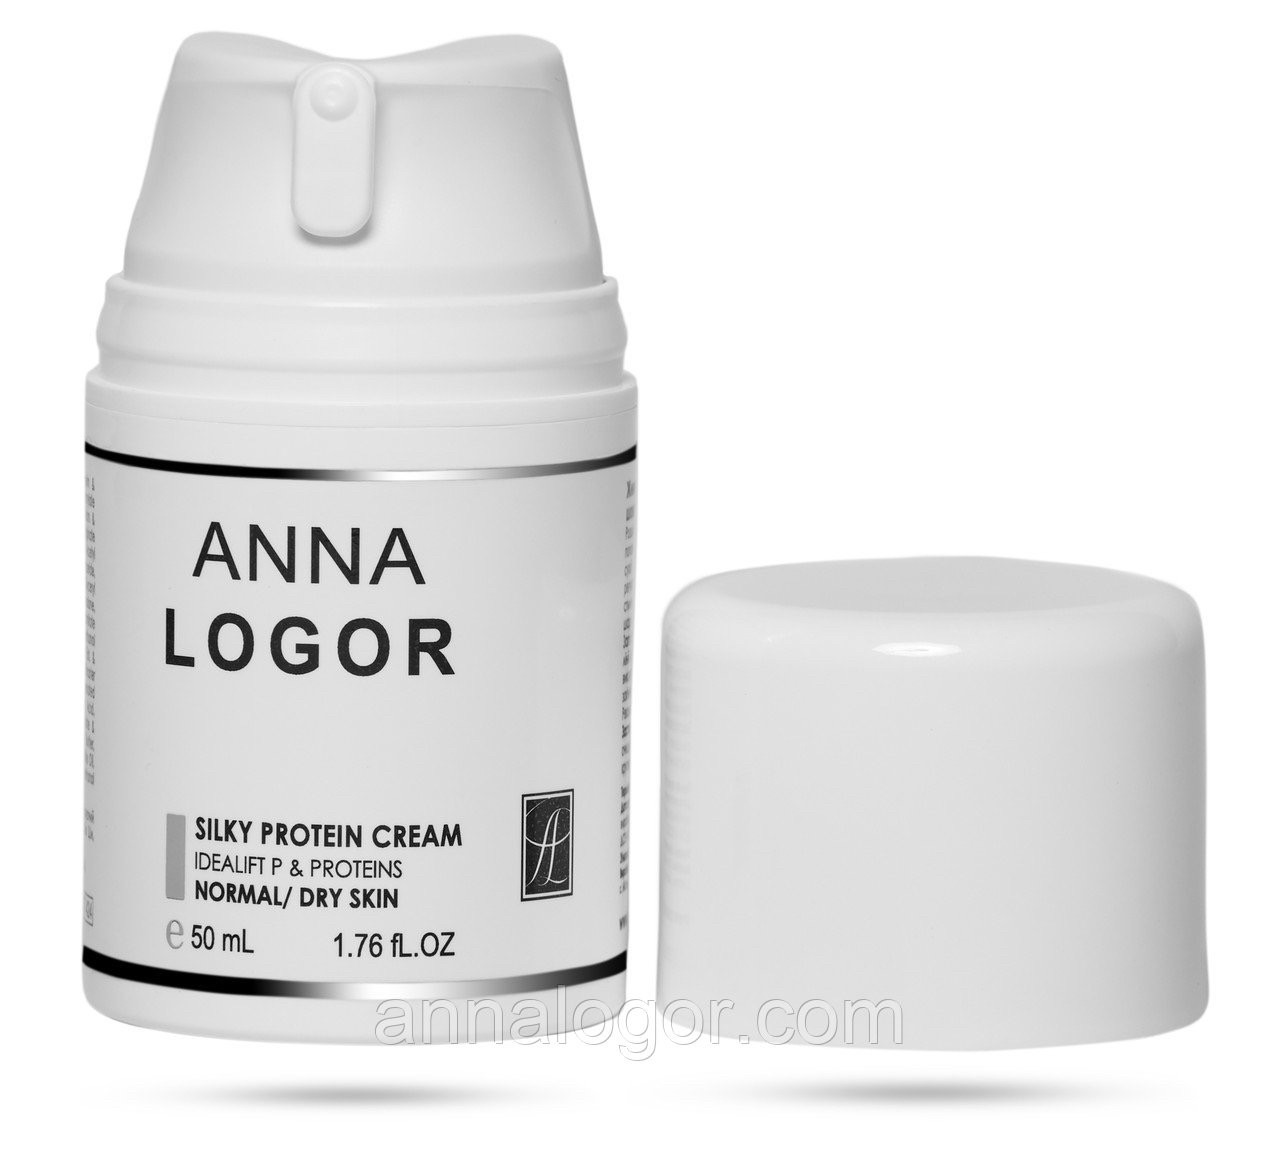 Крем живильний з протеїнами шовку Anna Logor Silky Protein Cream 50 ml Art.424